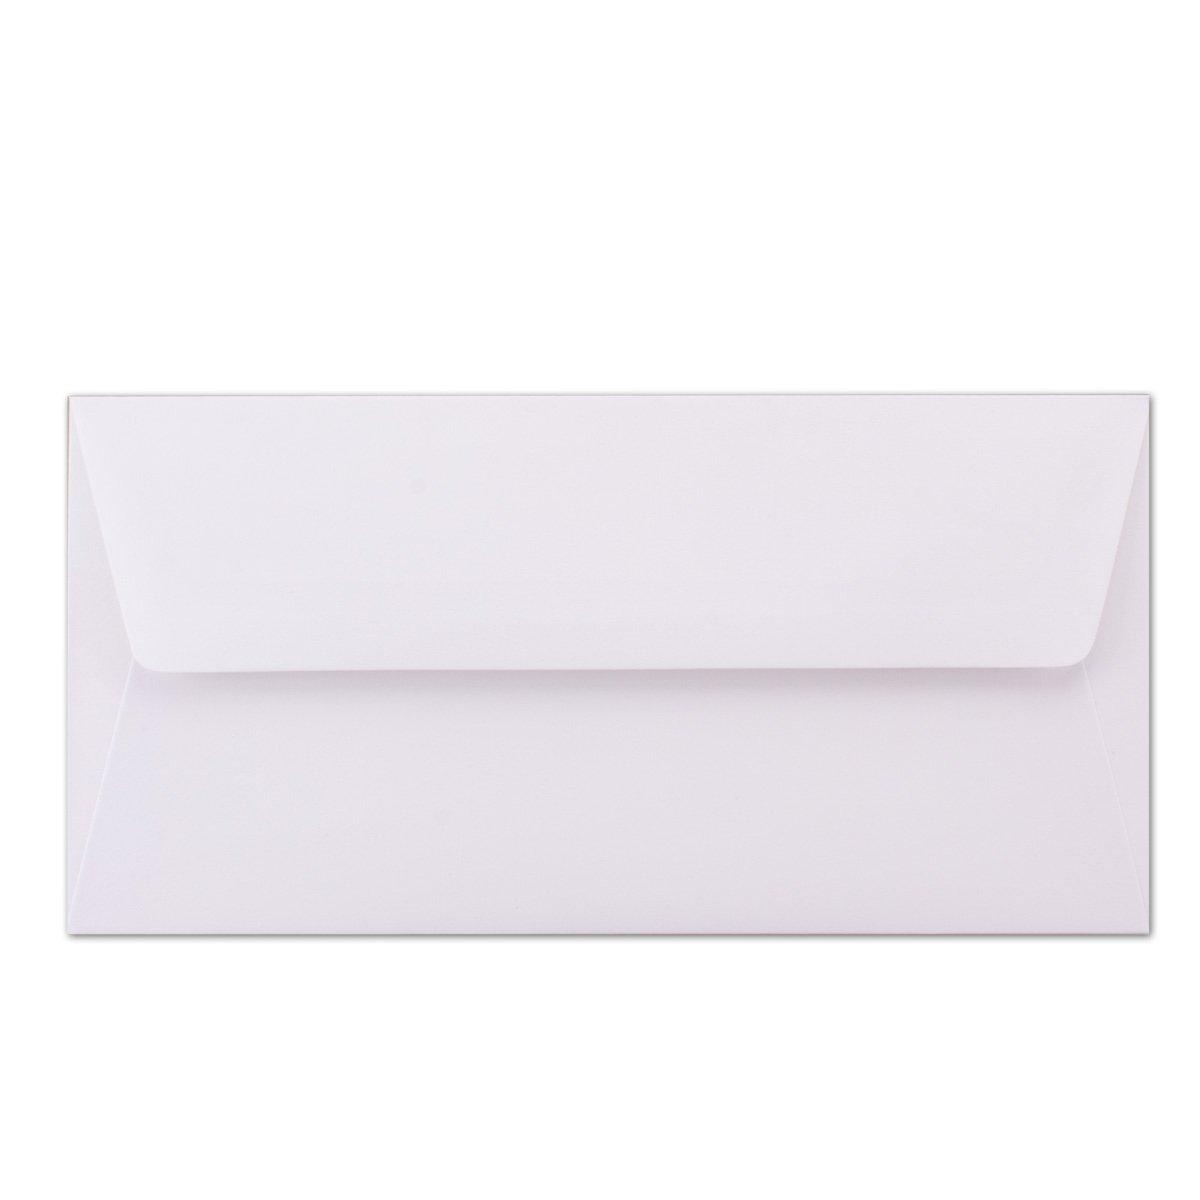 Buste bianche 22 x 11 cm DIN lungo Foderate con fodera in seta colorata Adesivo umido 25 pezzi Seidenfutter: dunkelblau 100 g//m2